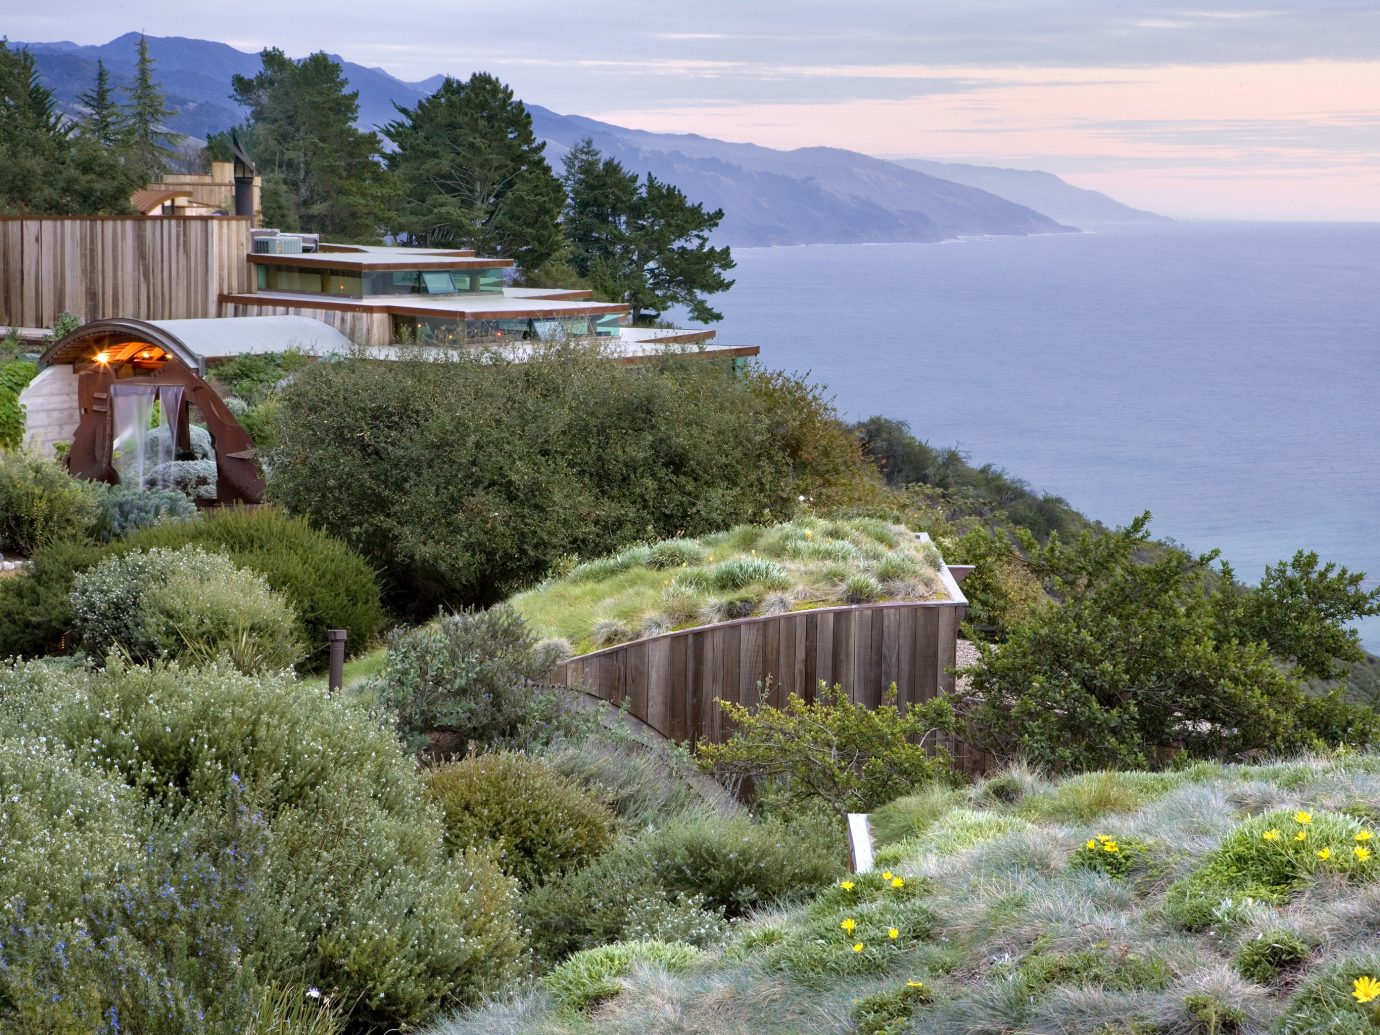 Hotels outdoor grass sky tree vacation plant estate landscape Coast Garden flower hillside